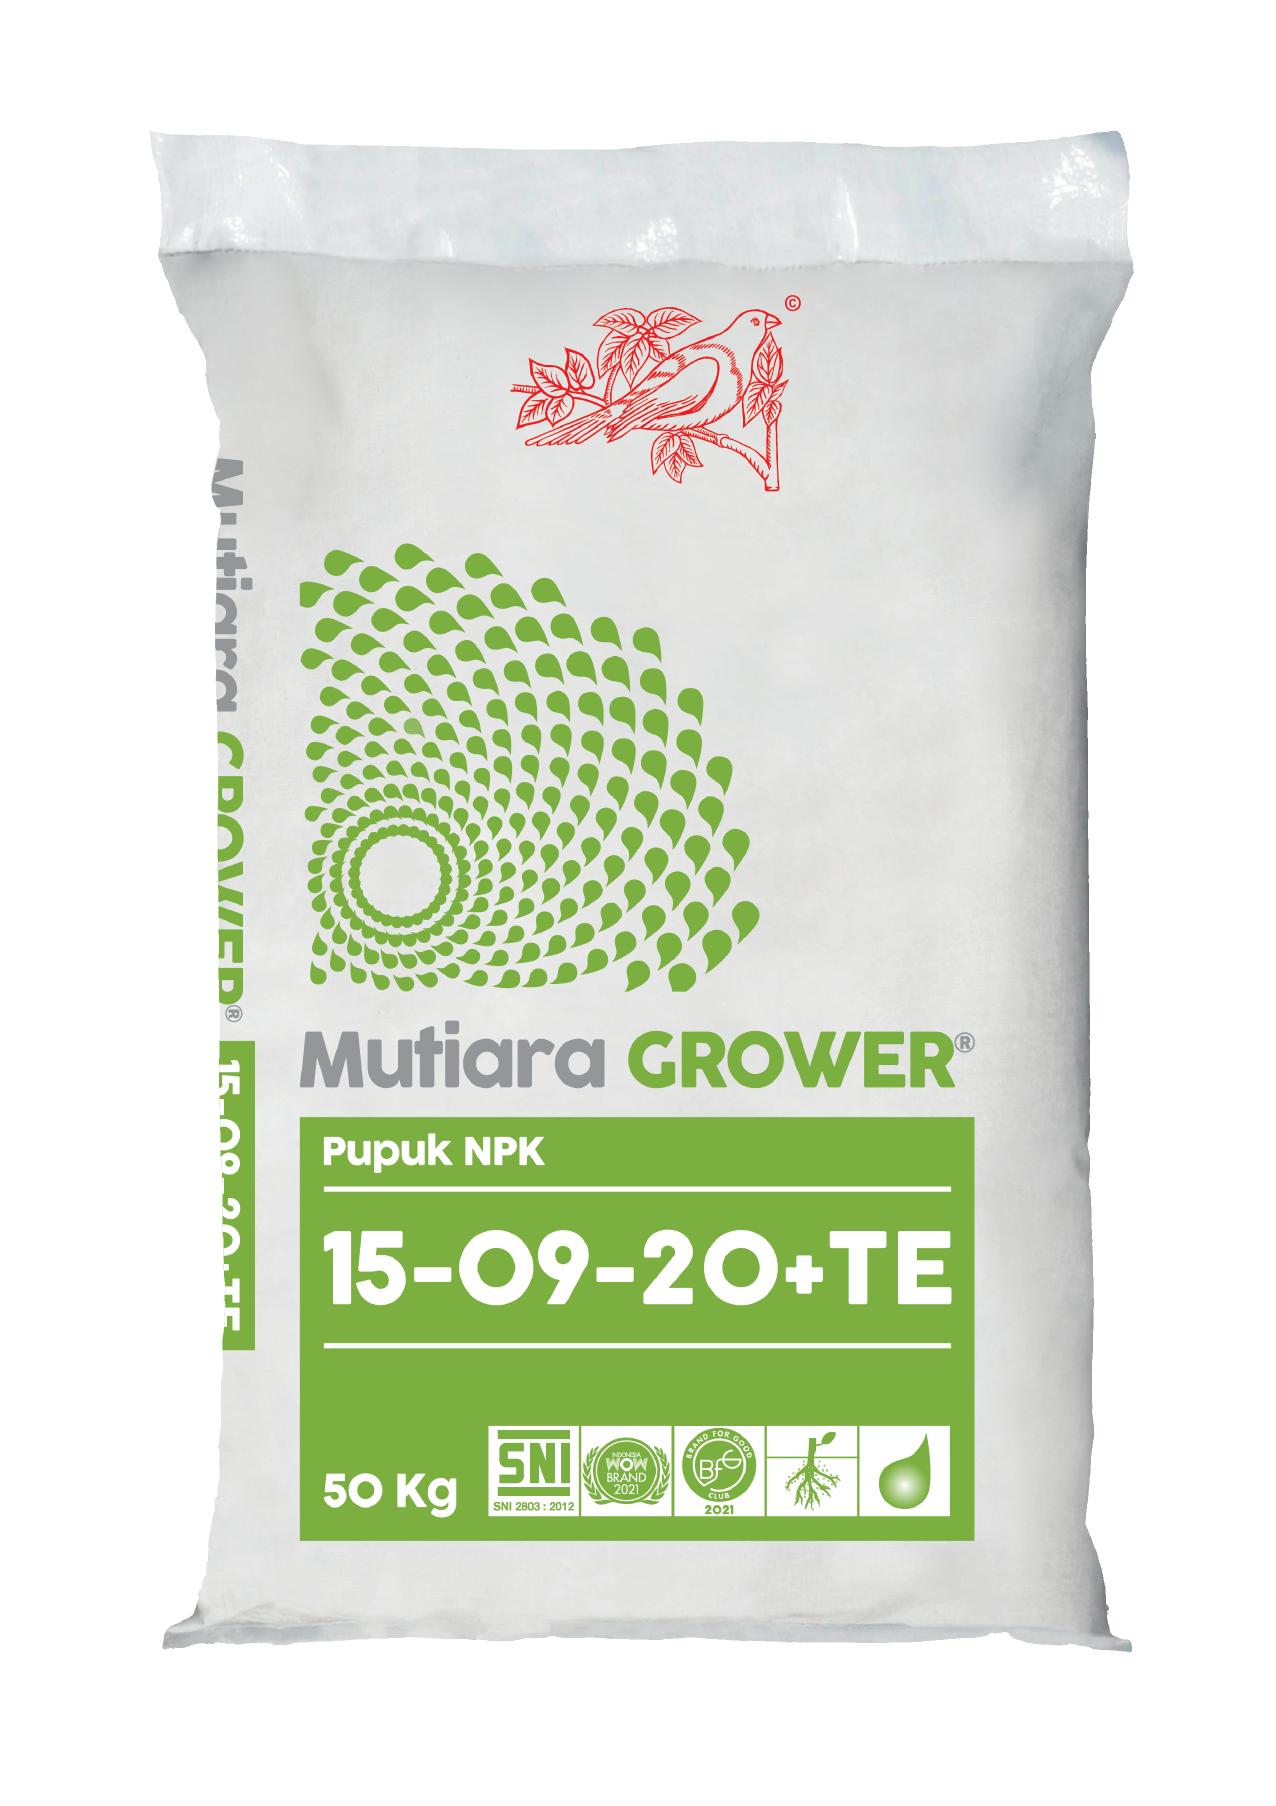 Mutiara GROWER